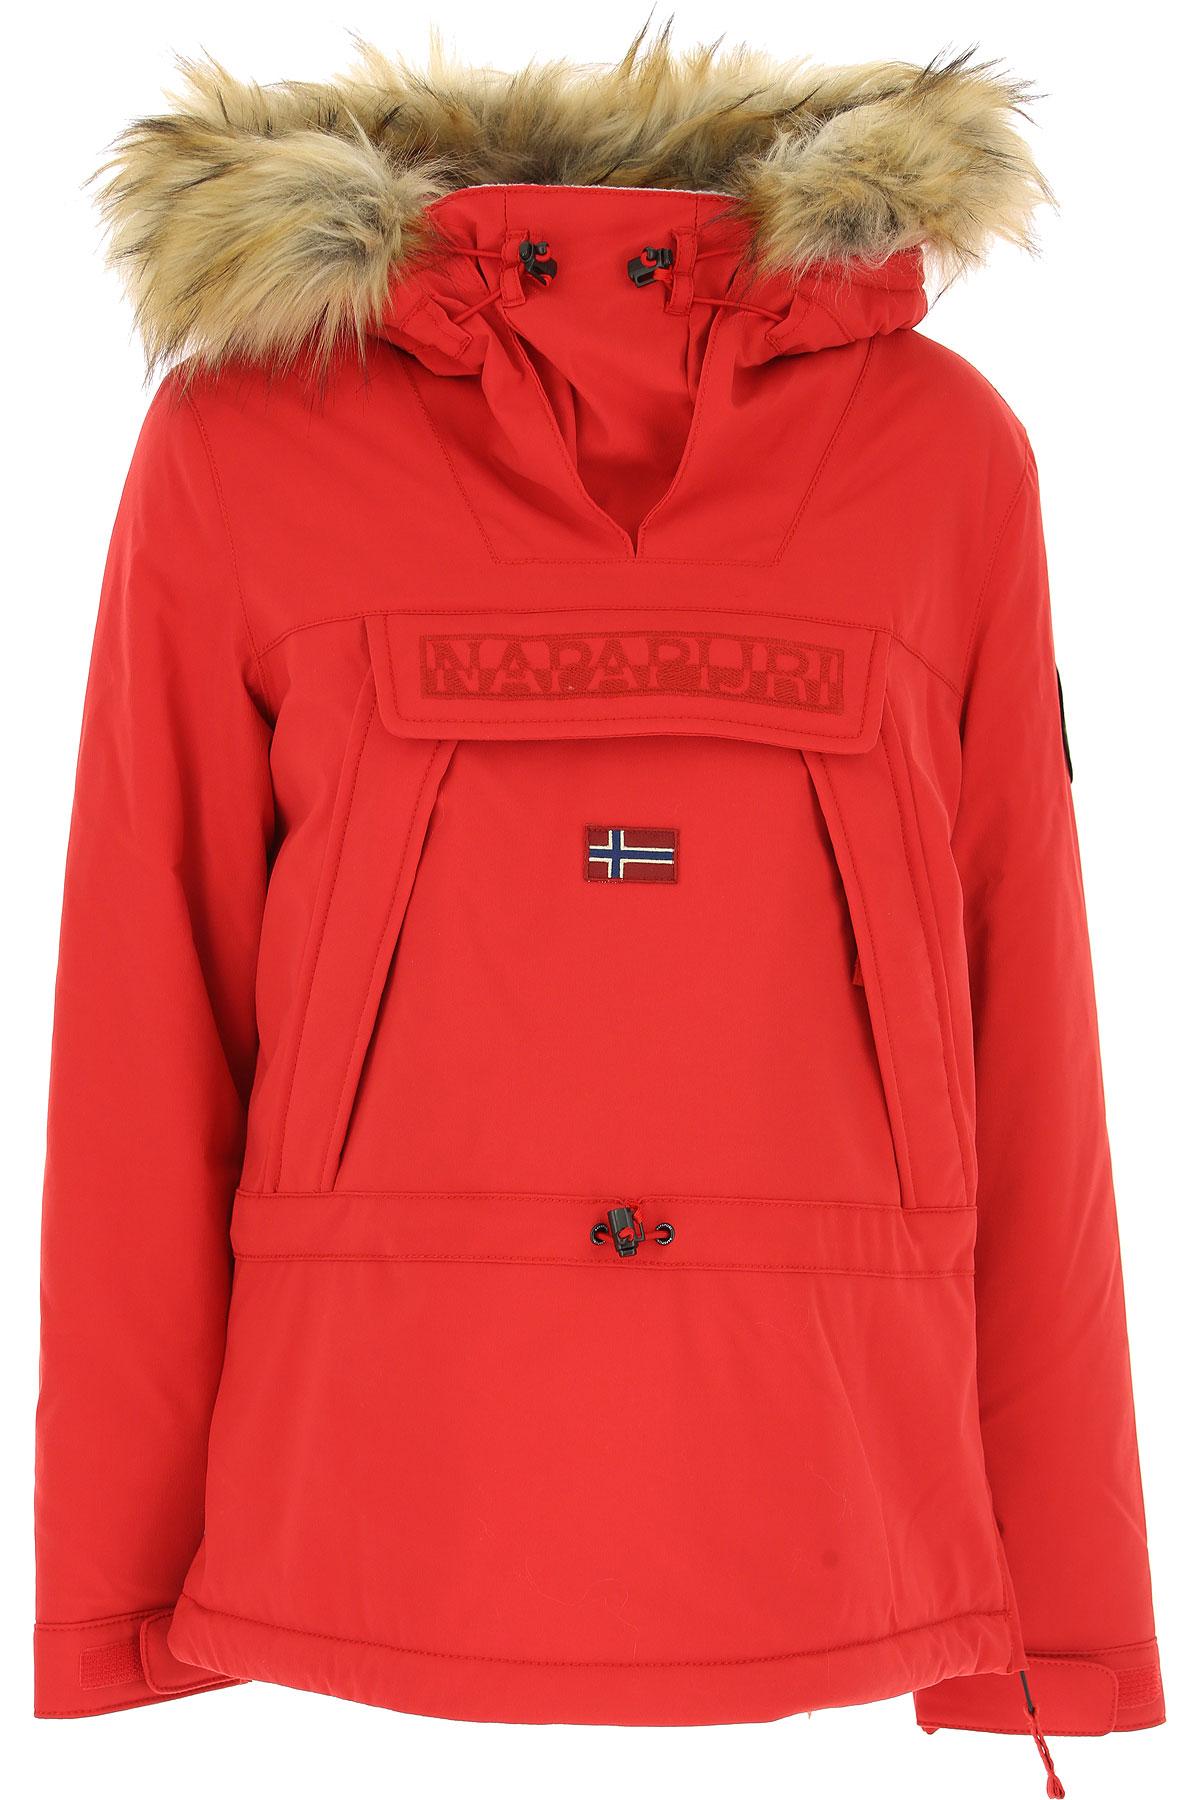 Napapijri Jacket for Women, Red, polyamide, 2017, 10 6 8